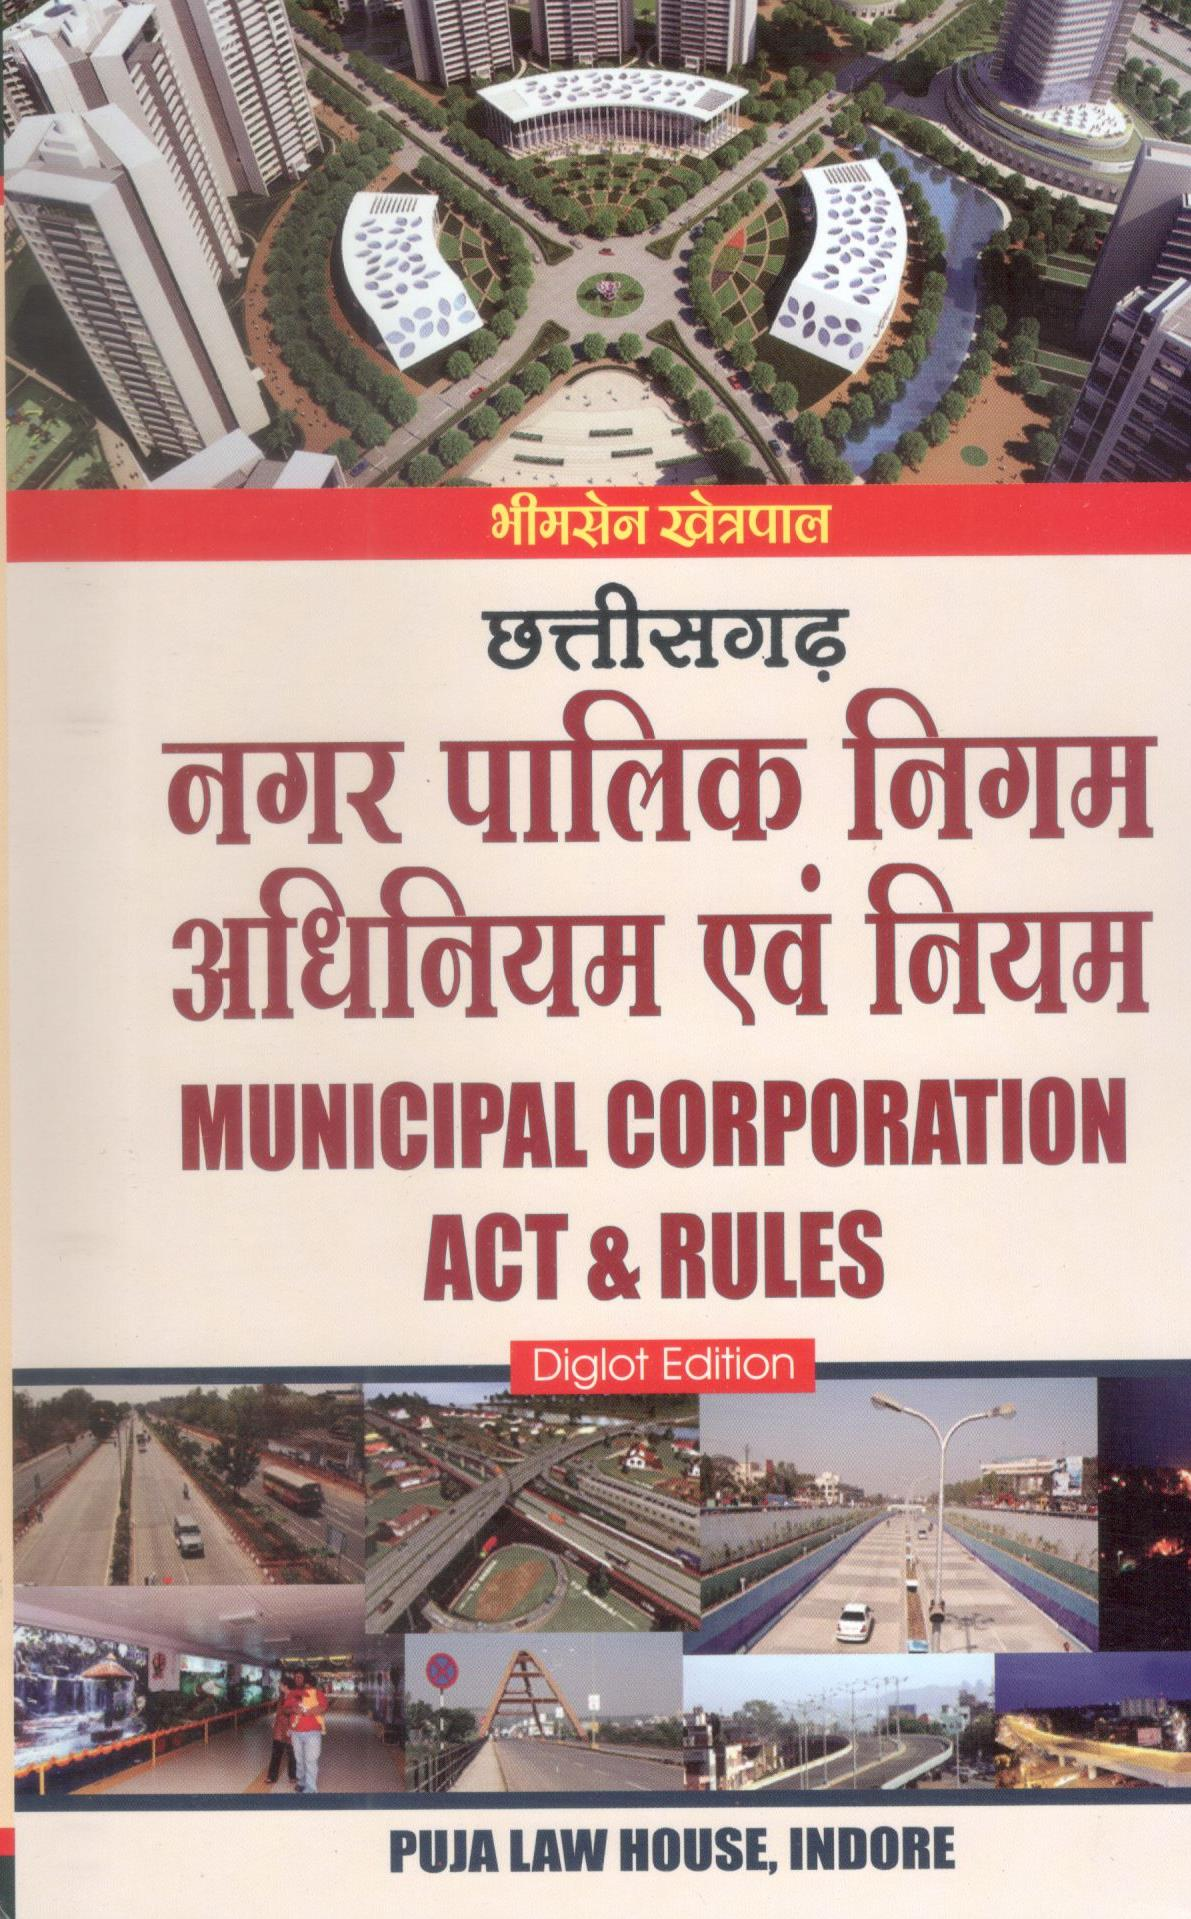 Buy छ. ग. नगर पालिक निगम अधिनियम �वं नियम / C.G. Municipal Corporation Act & Rules